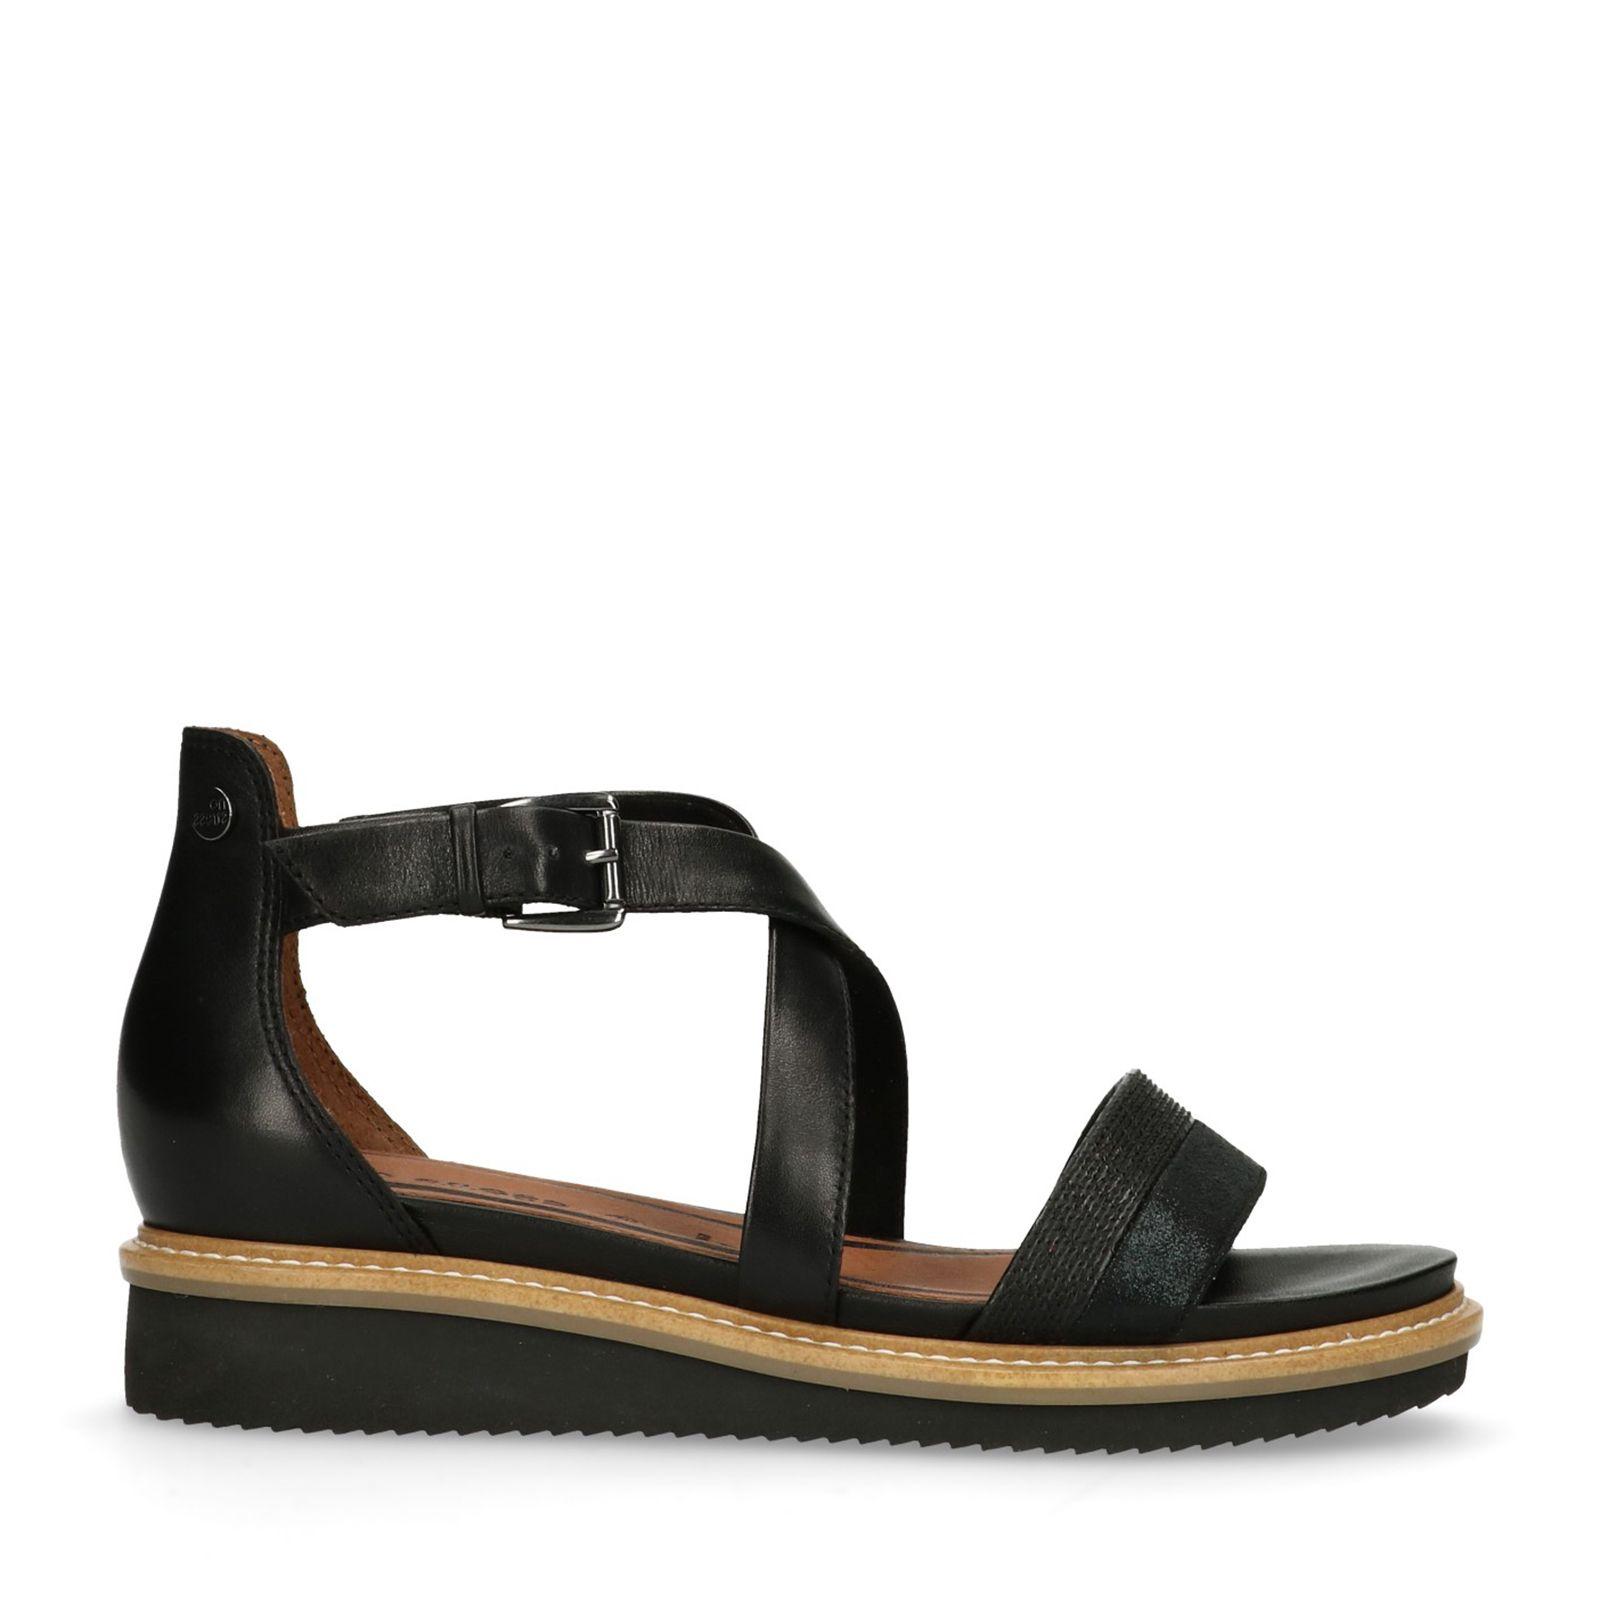 Black Dames Sandalen Zwarte Shoes Shopping Schoenen Manfield En f5I5rW